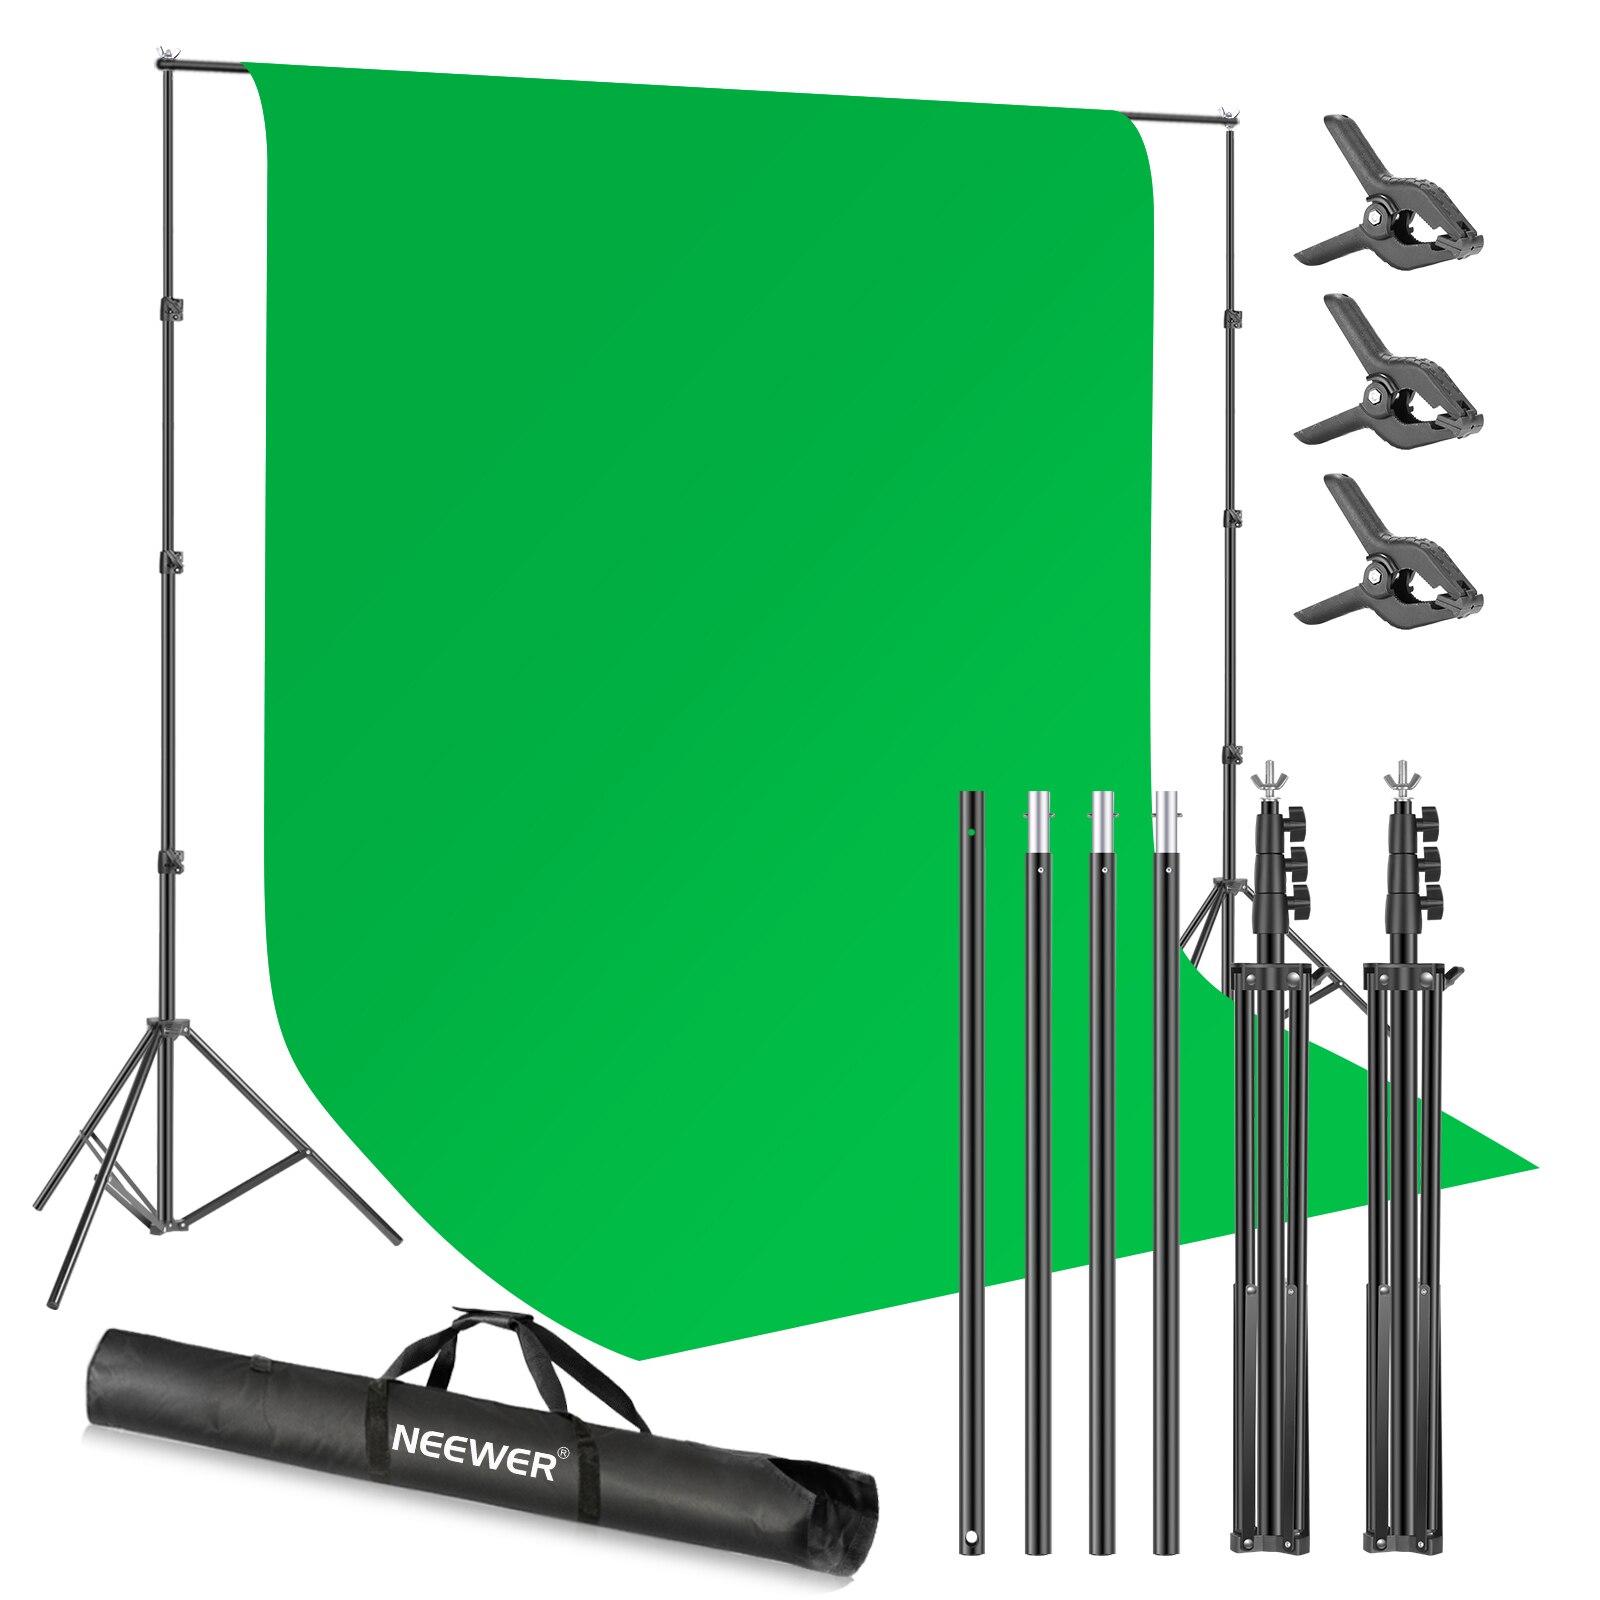 Neewer-خلفية استوديو خضراء ، ونظام دعم خلفية للتصوير الفوتوغرافي مع خلفية خضراء كروماكي و 3 مشابك خلفية